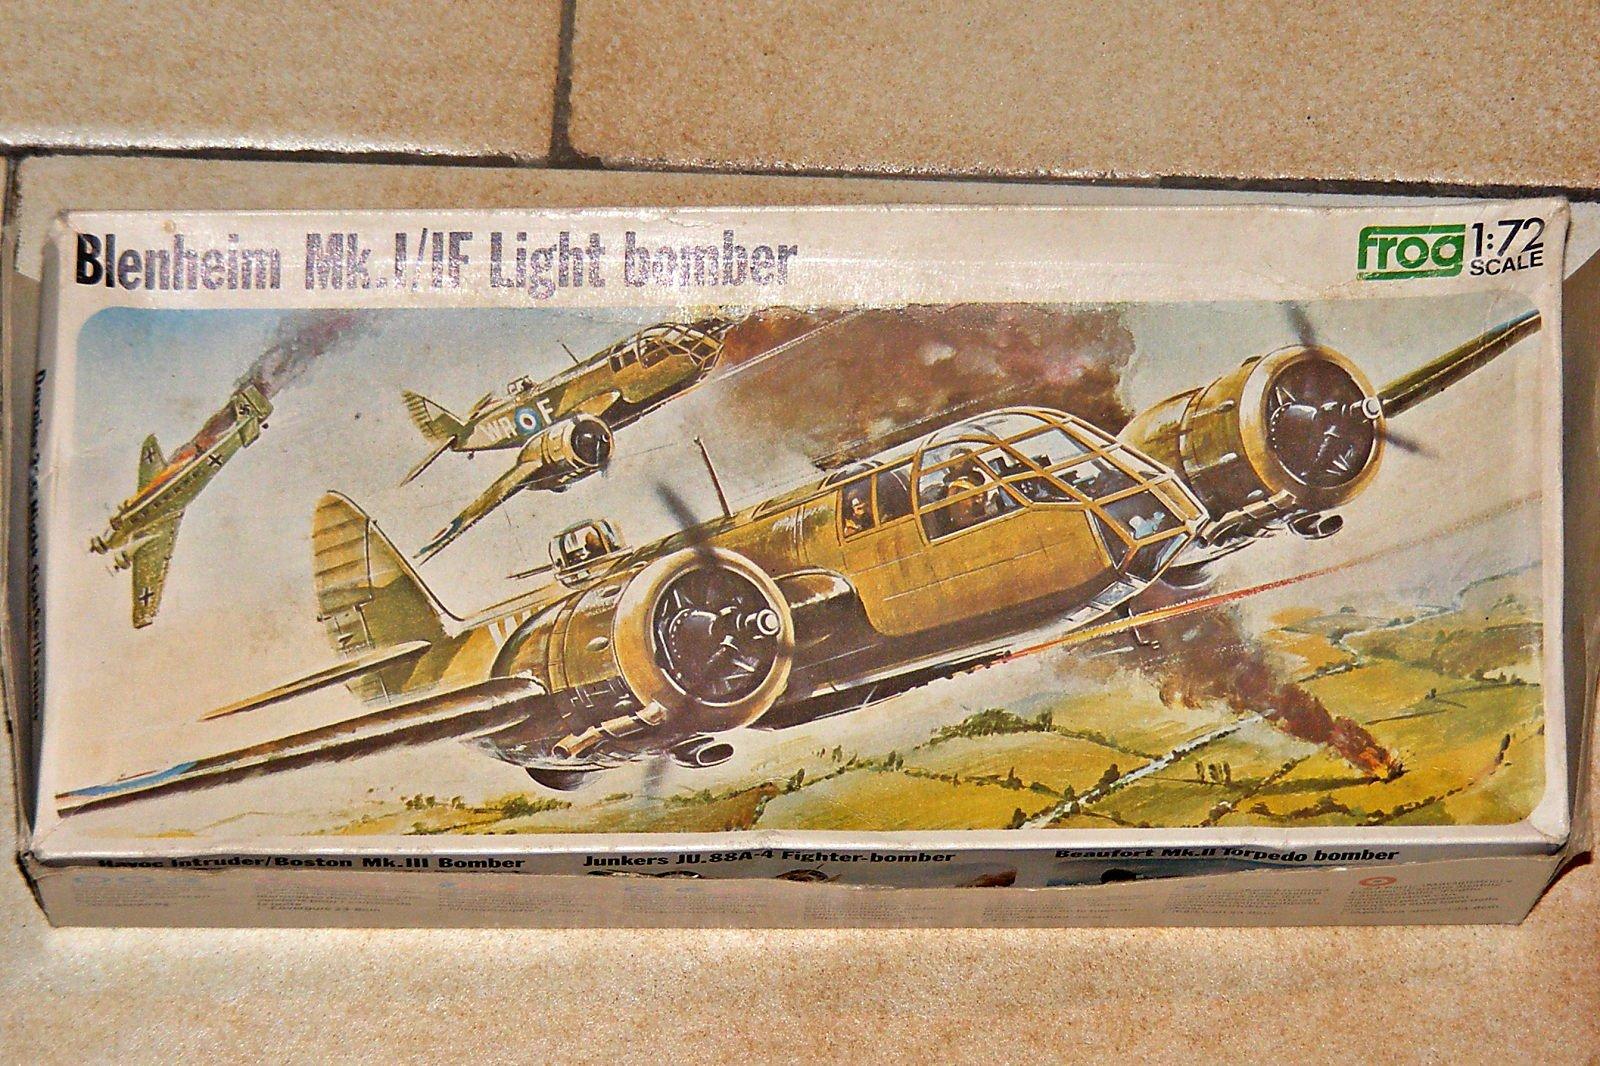 bristol blenheim Mk.I FROG 1/72